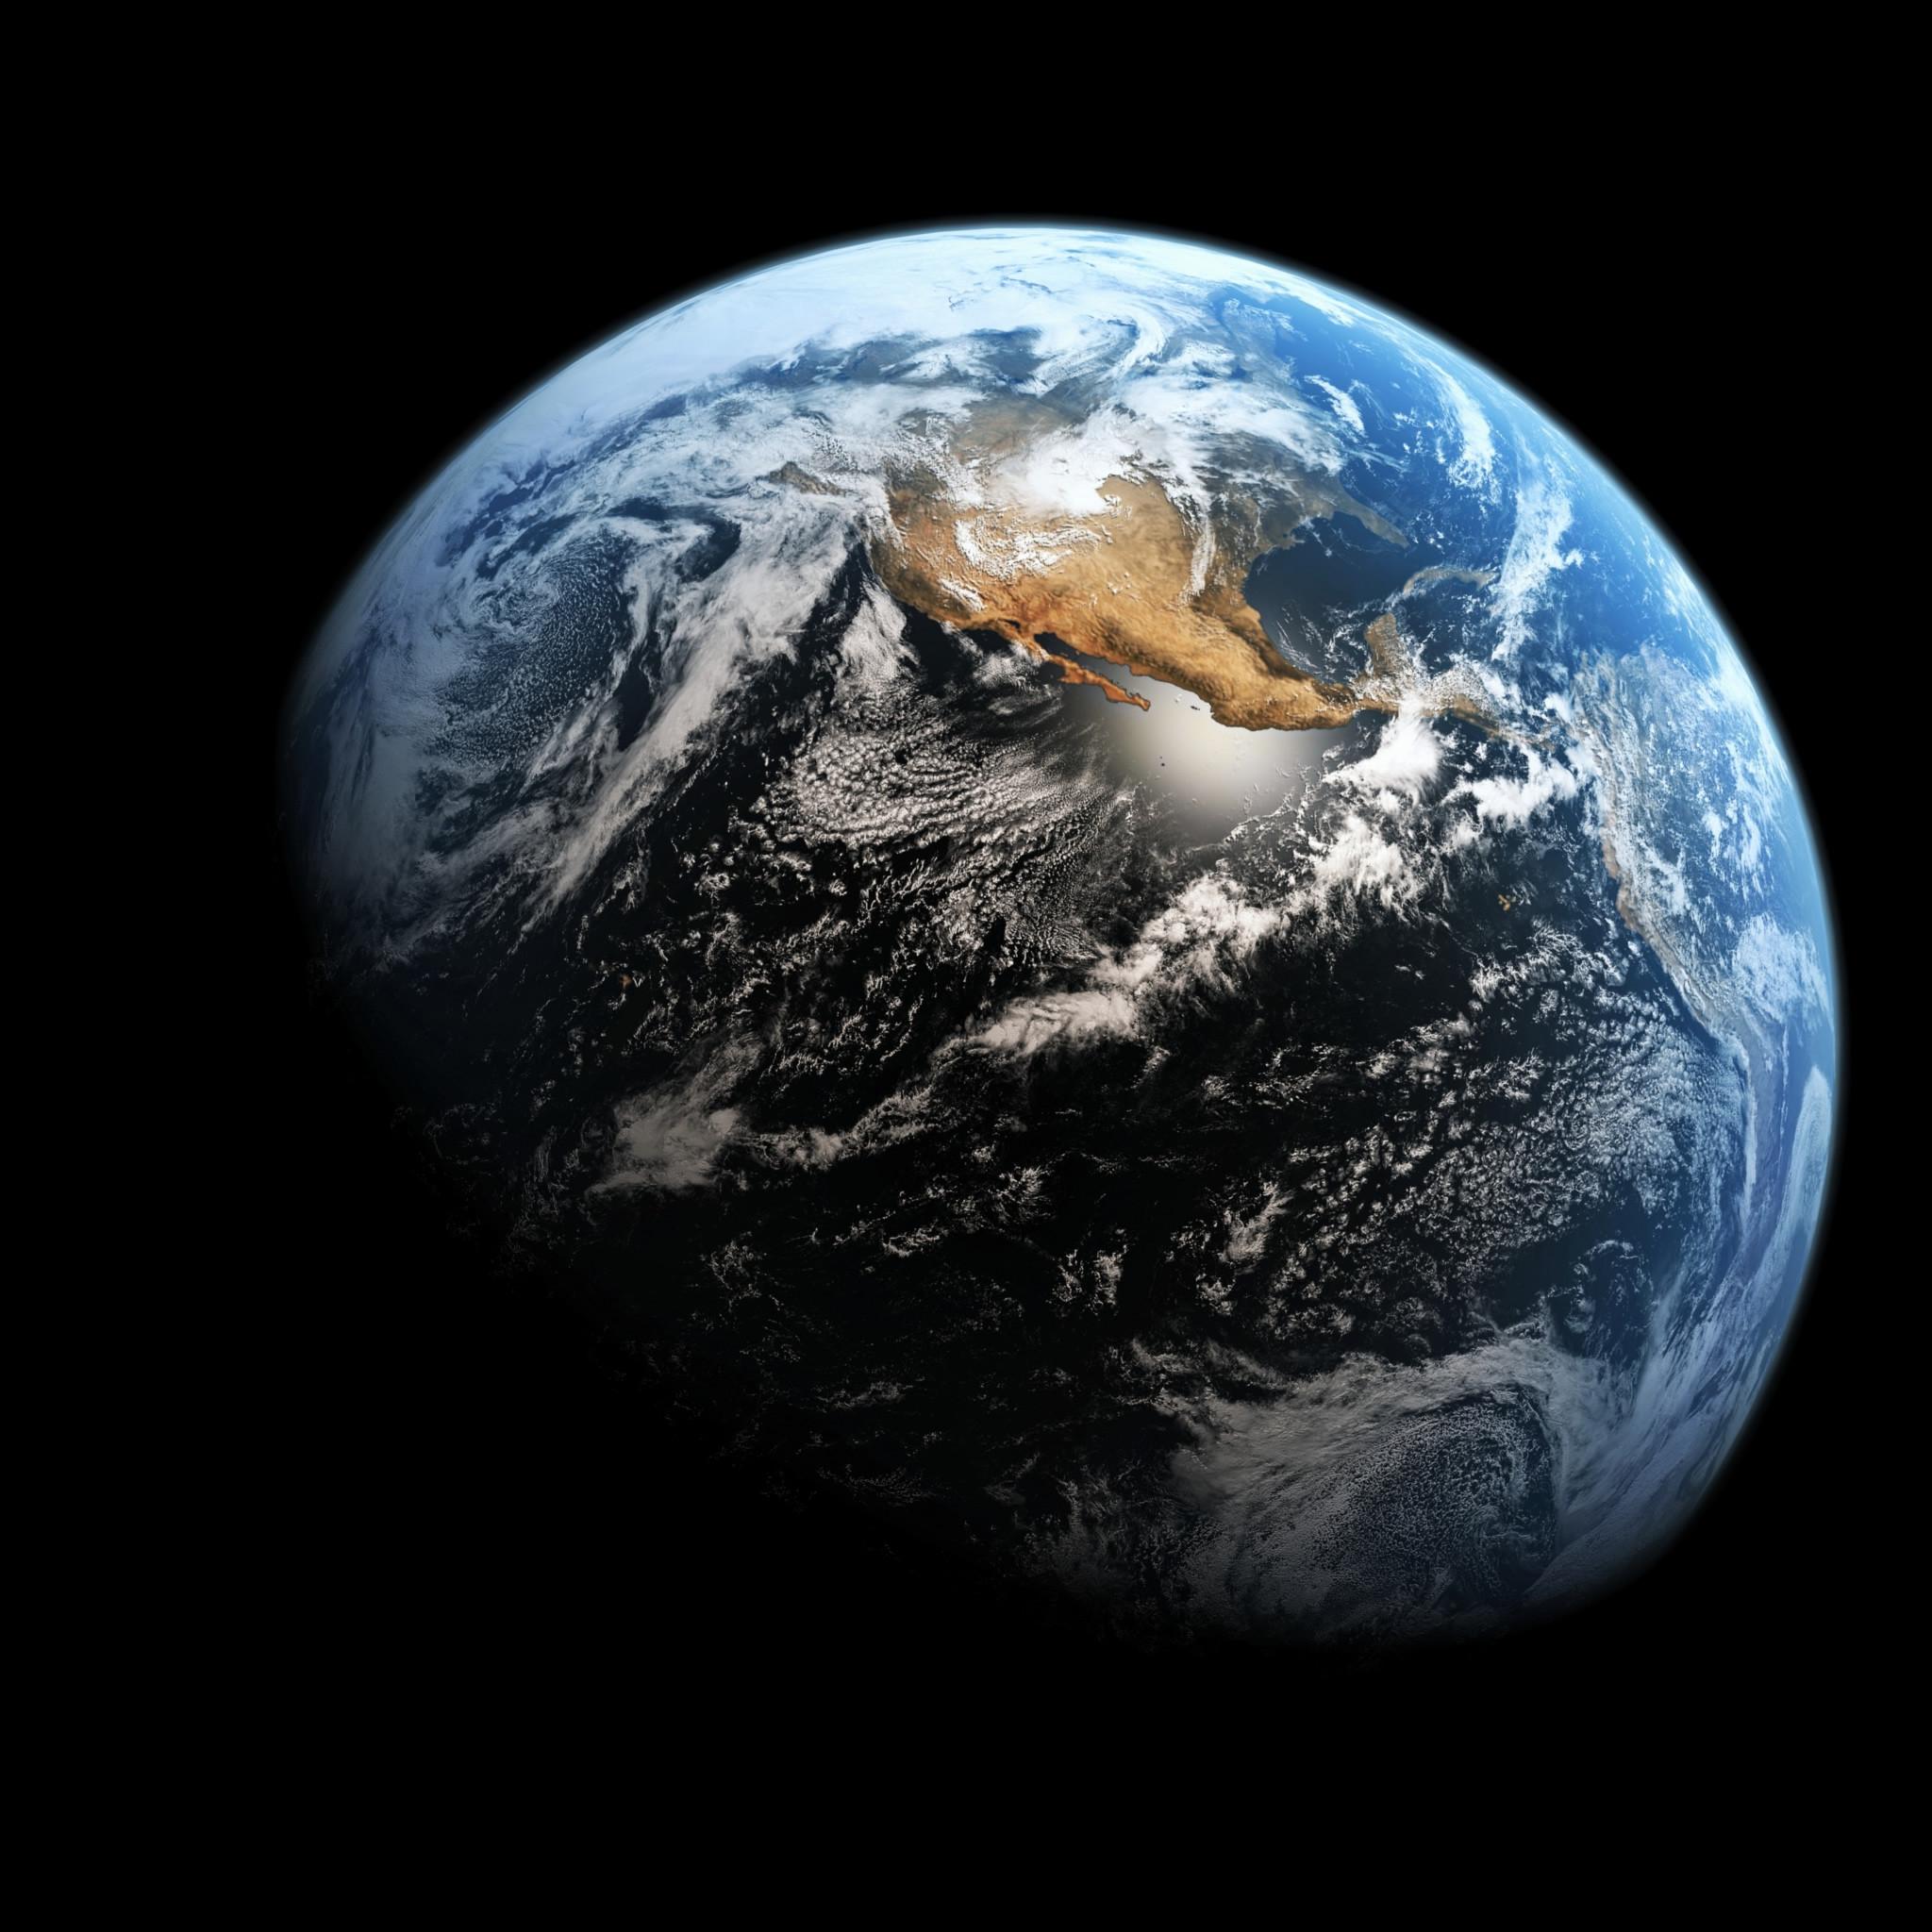 Earth 8 iPad Air Wallpaper Download   iPhone Wallpapers, iPad .